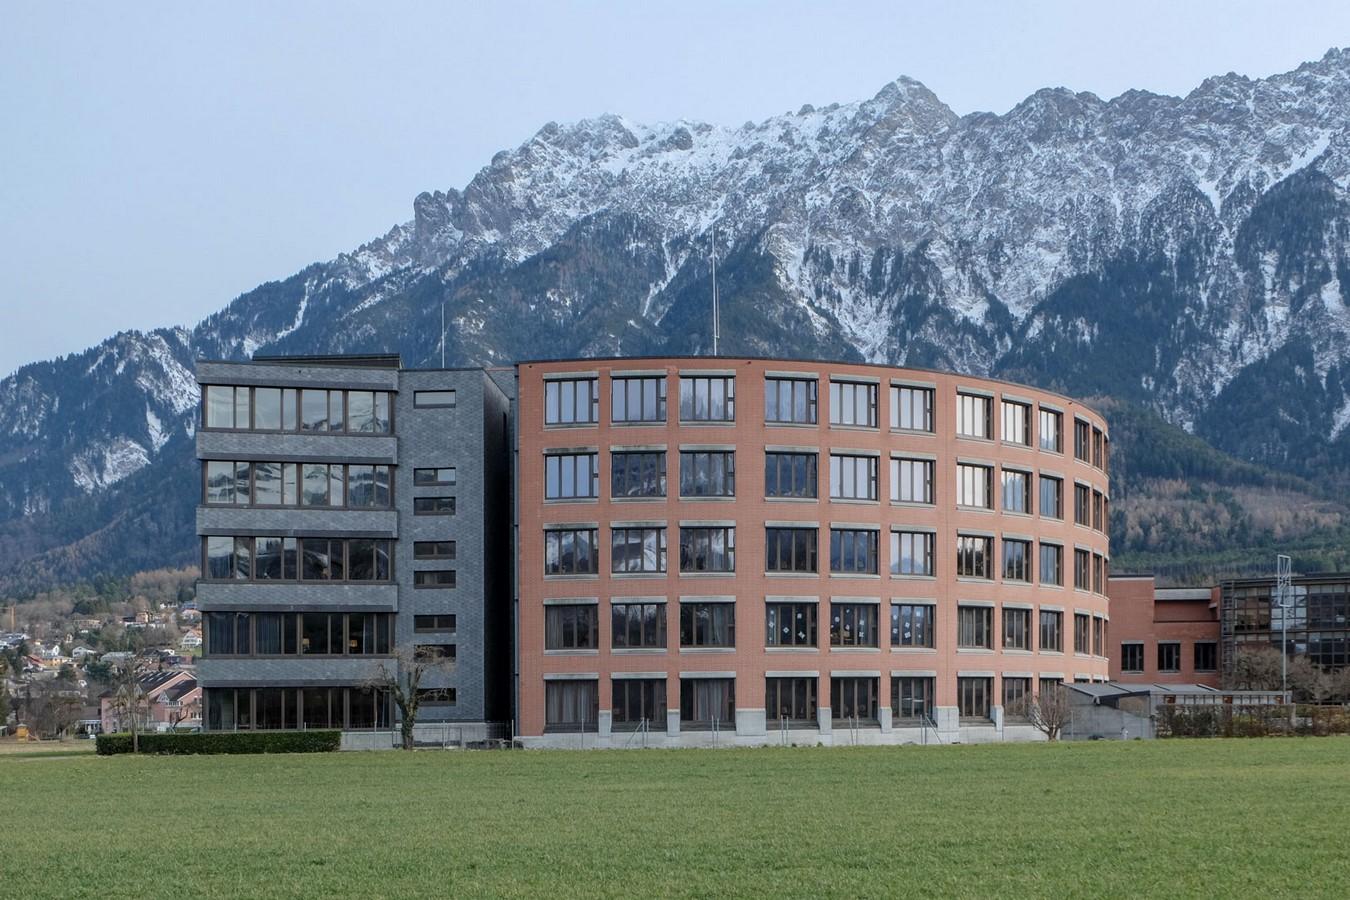 School Center,Mühleholz - Sheet2